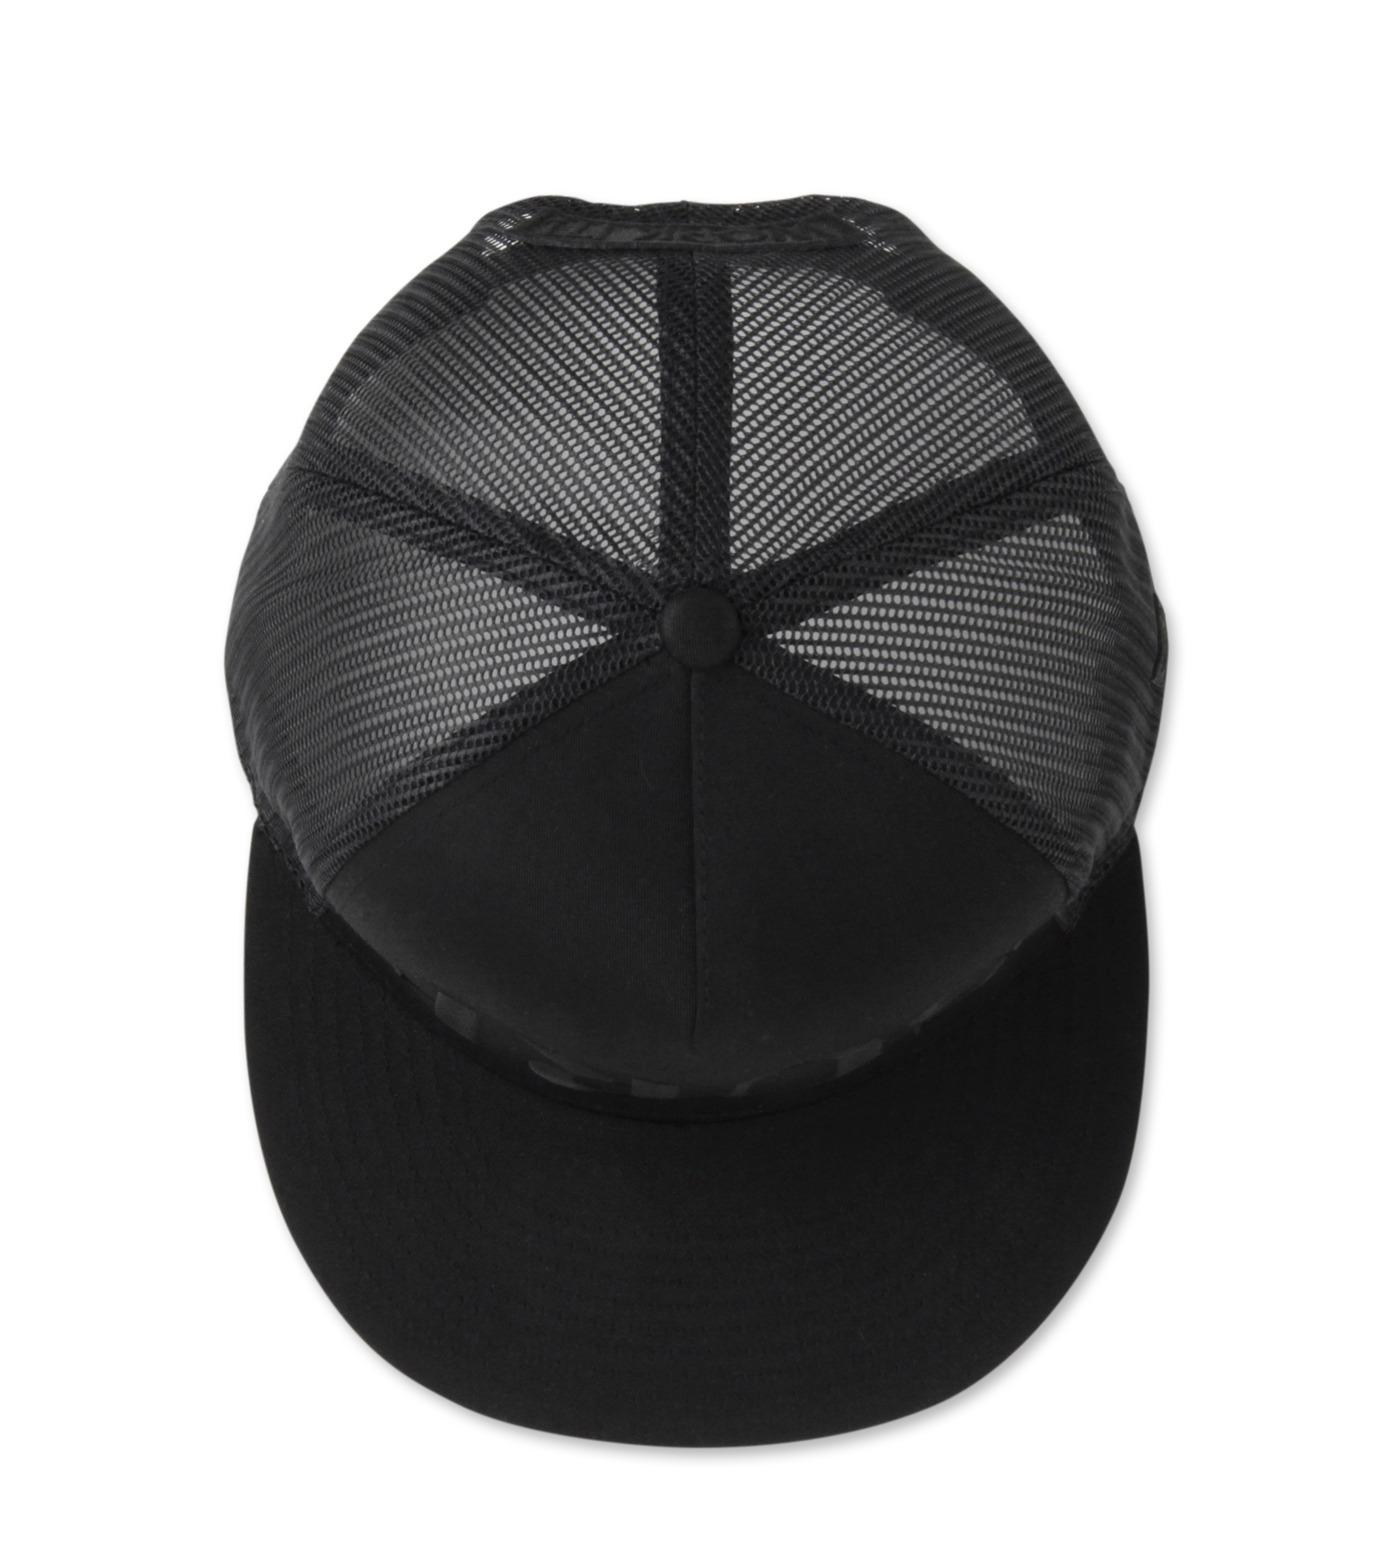 HEY YOU !(ヘイユウ)のSURF Mesh CAP-BLACK(キャップ/cap)-Surf-Cap2 拡大詳細画像4